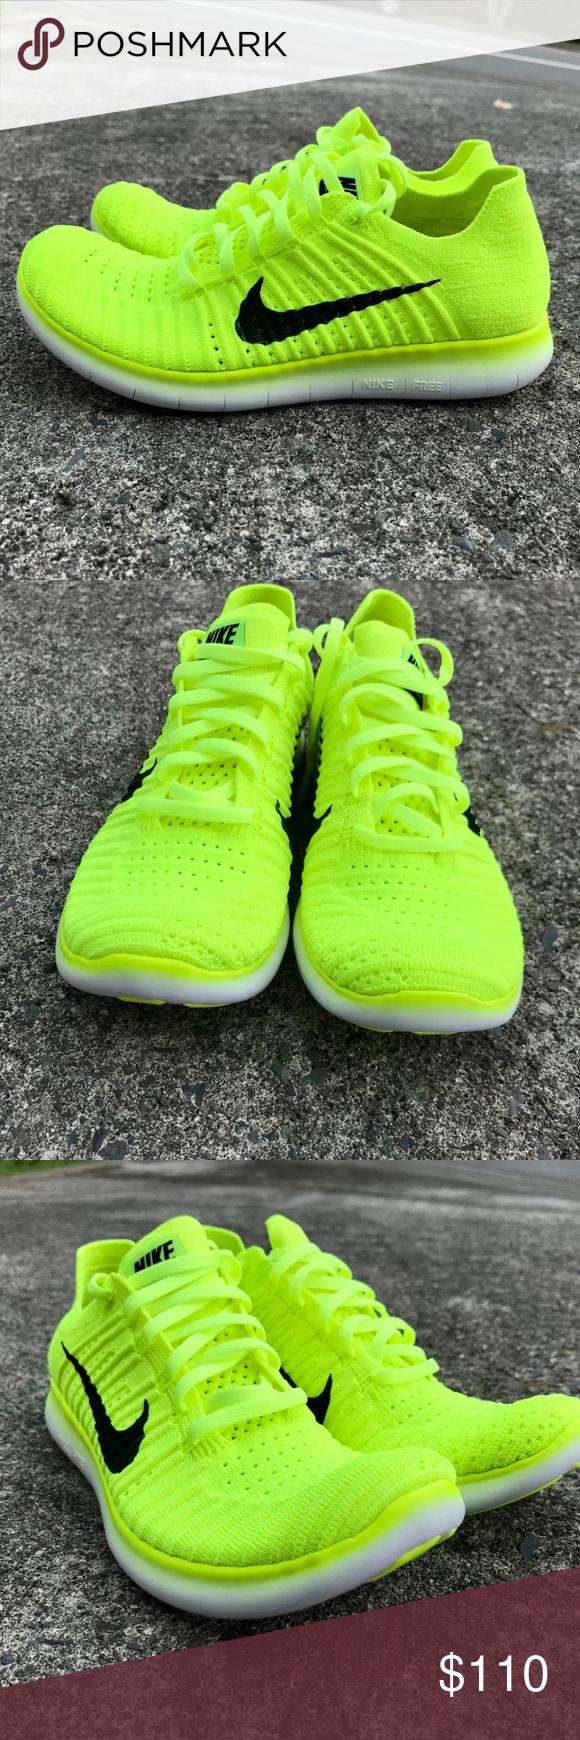 e0907ca8e409 Nike Free RN Flyknit